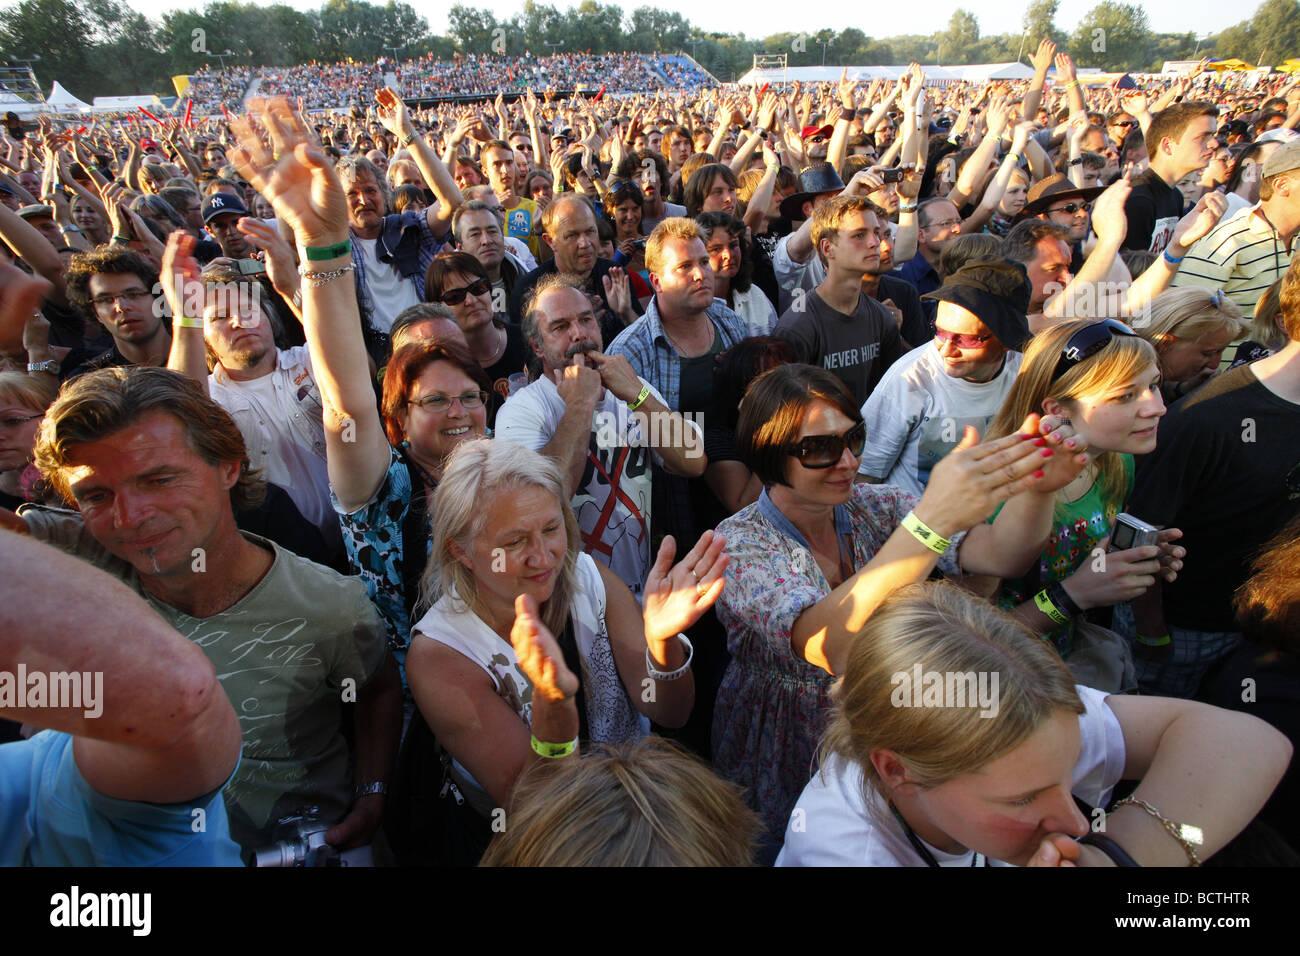 Spectators at the Open Air Festival, Muehldorf am Inn, Bavaria, Germany Stock Photo